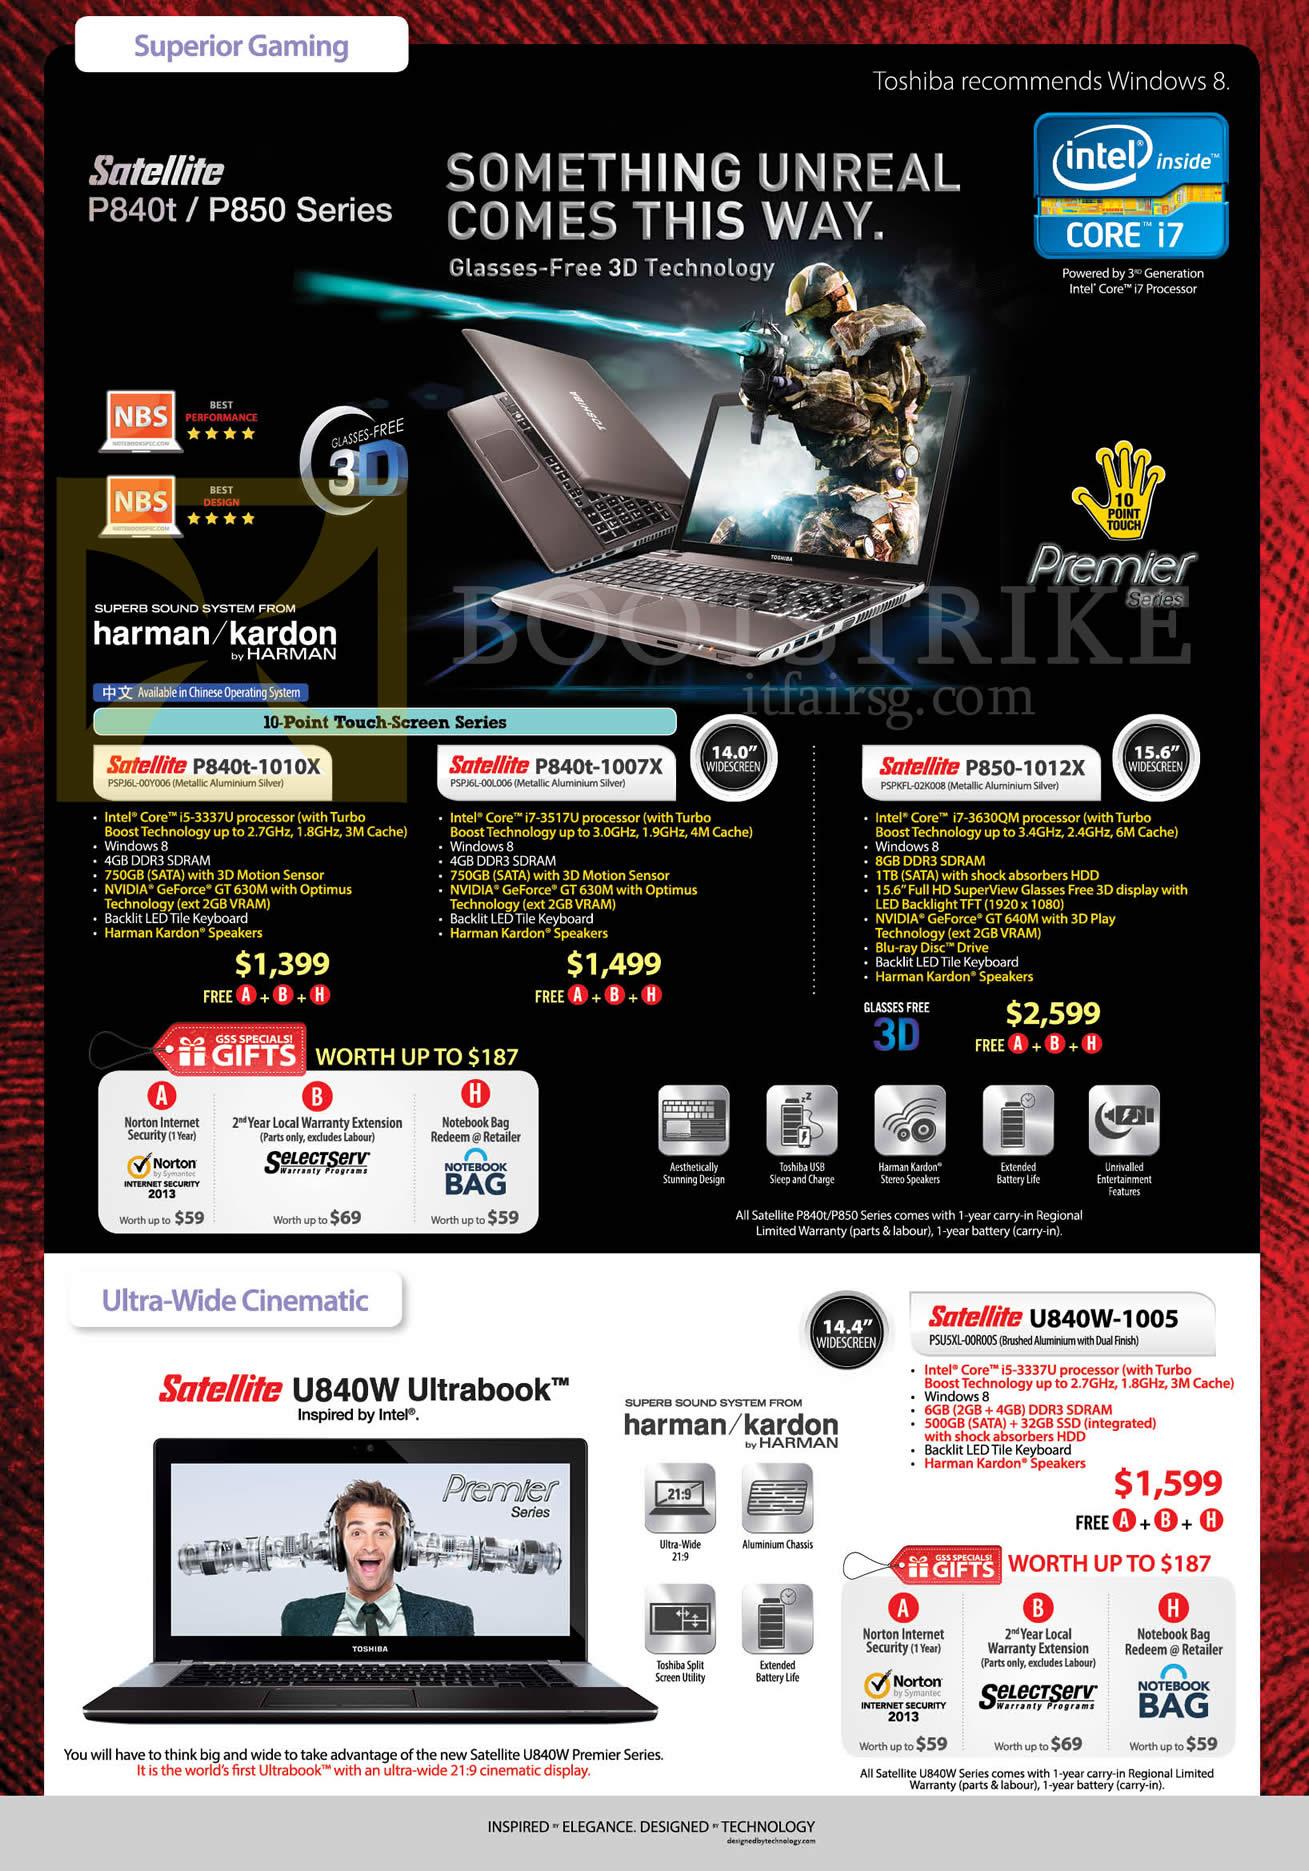 PC SHOW 2013 price list image brochure of Toshiba Notebooks Satellite P840t-1010x, 1007X, 1012X, U840W-1005